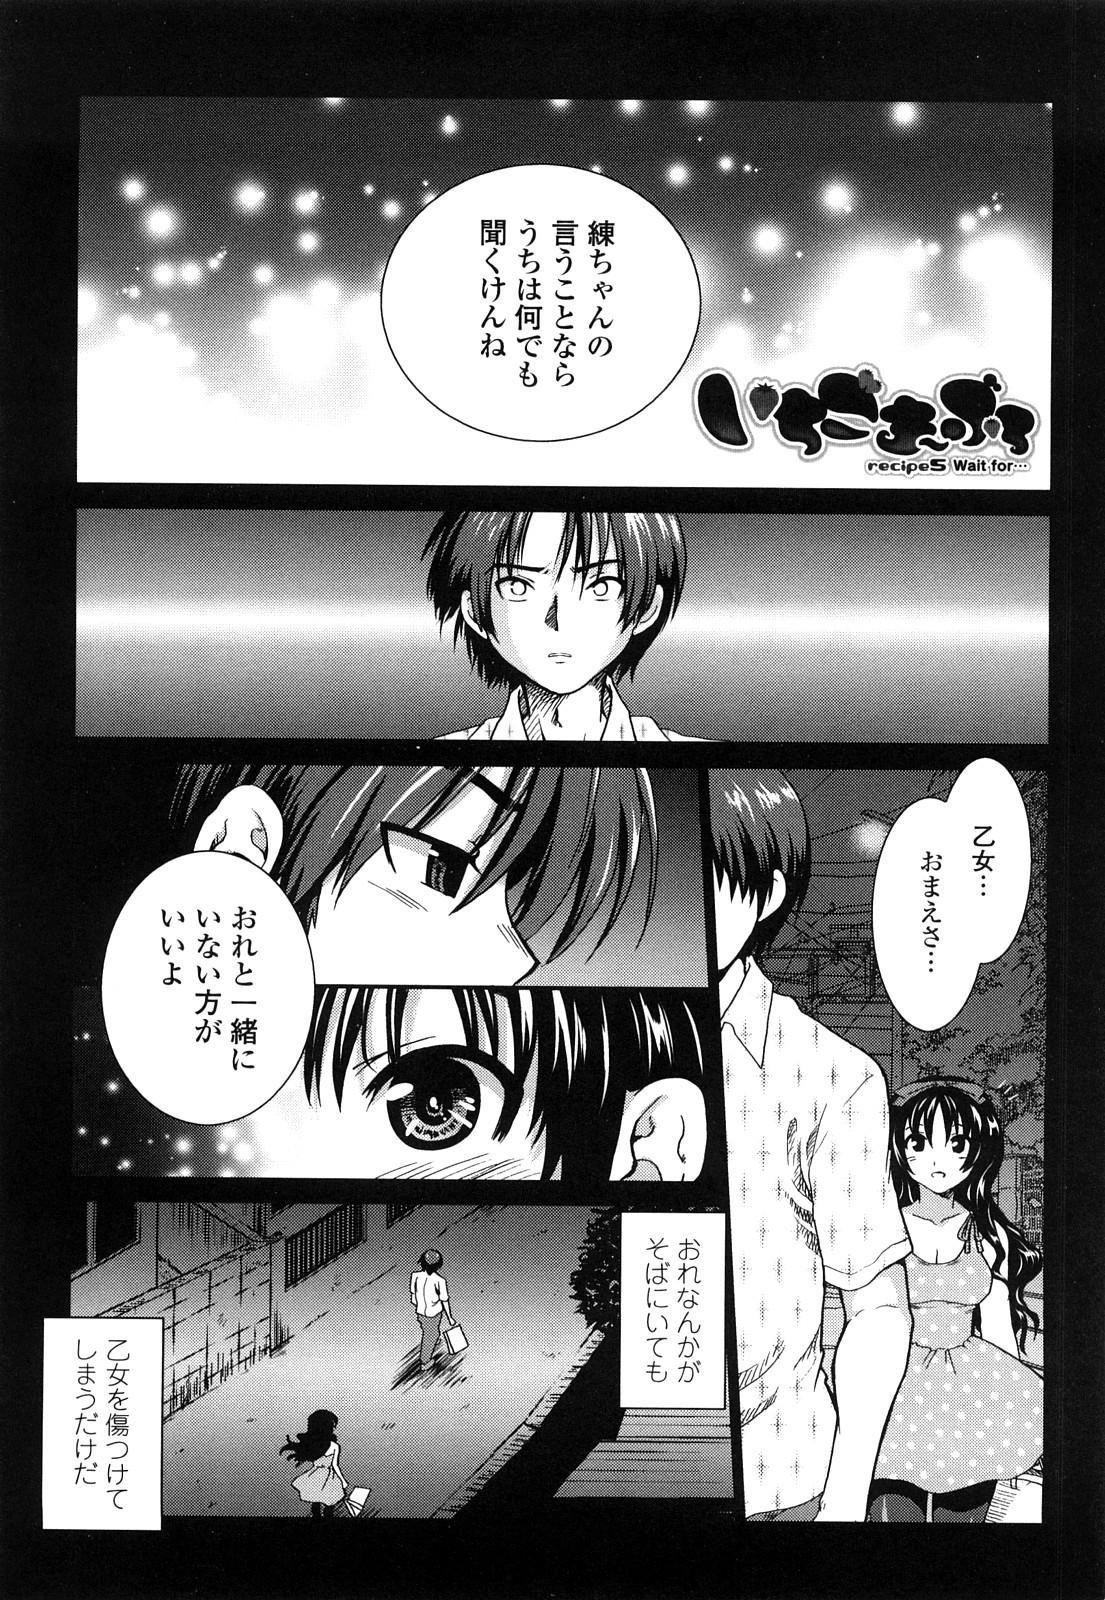 Ichigo Marble 85